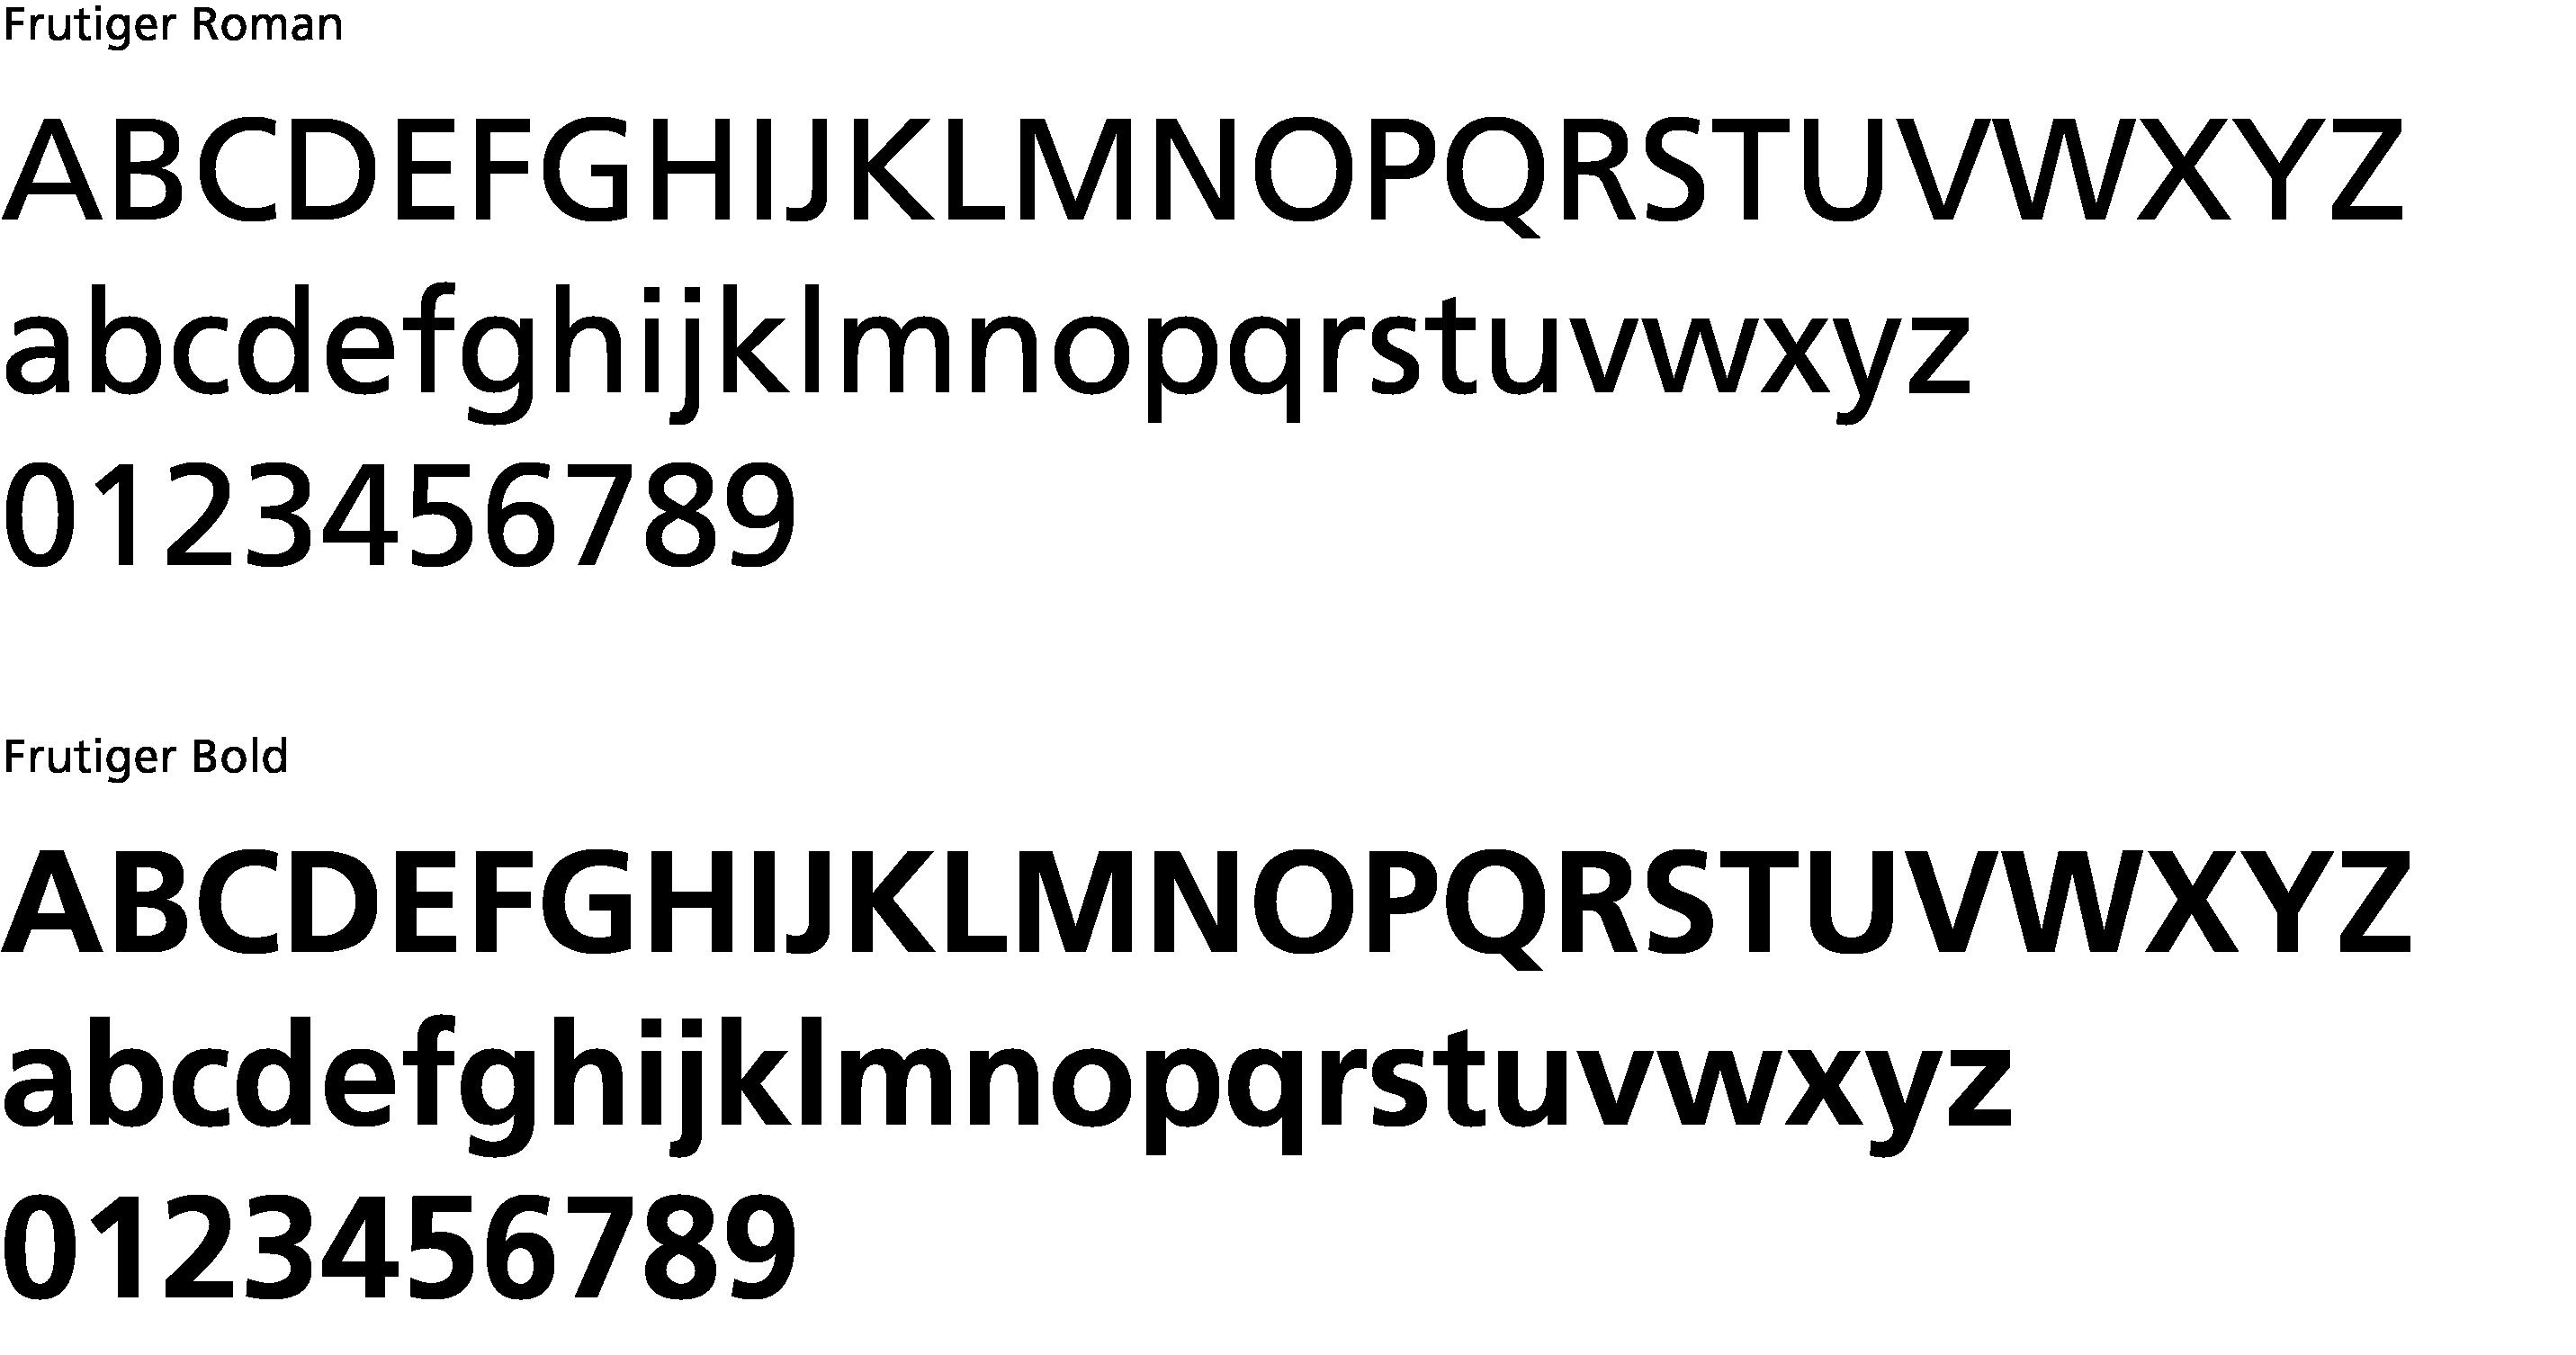 frutiger-typeface2x